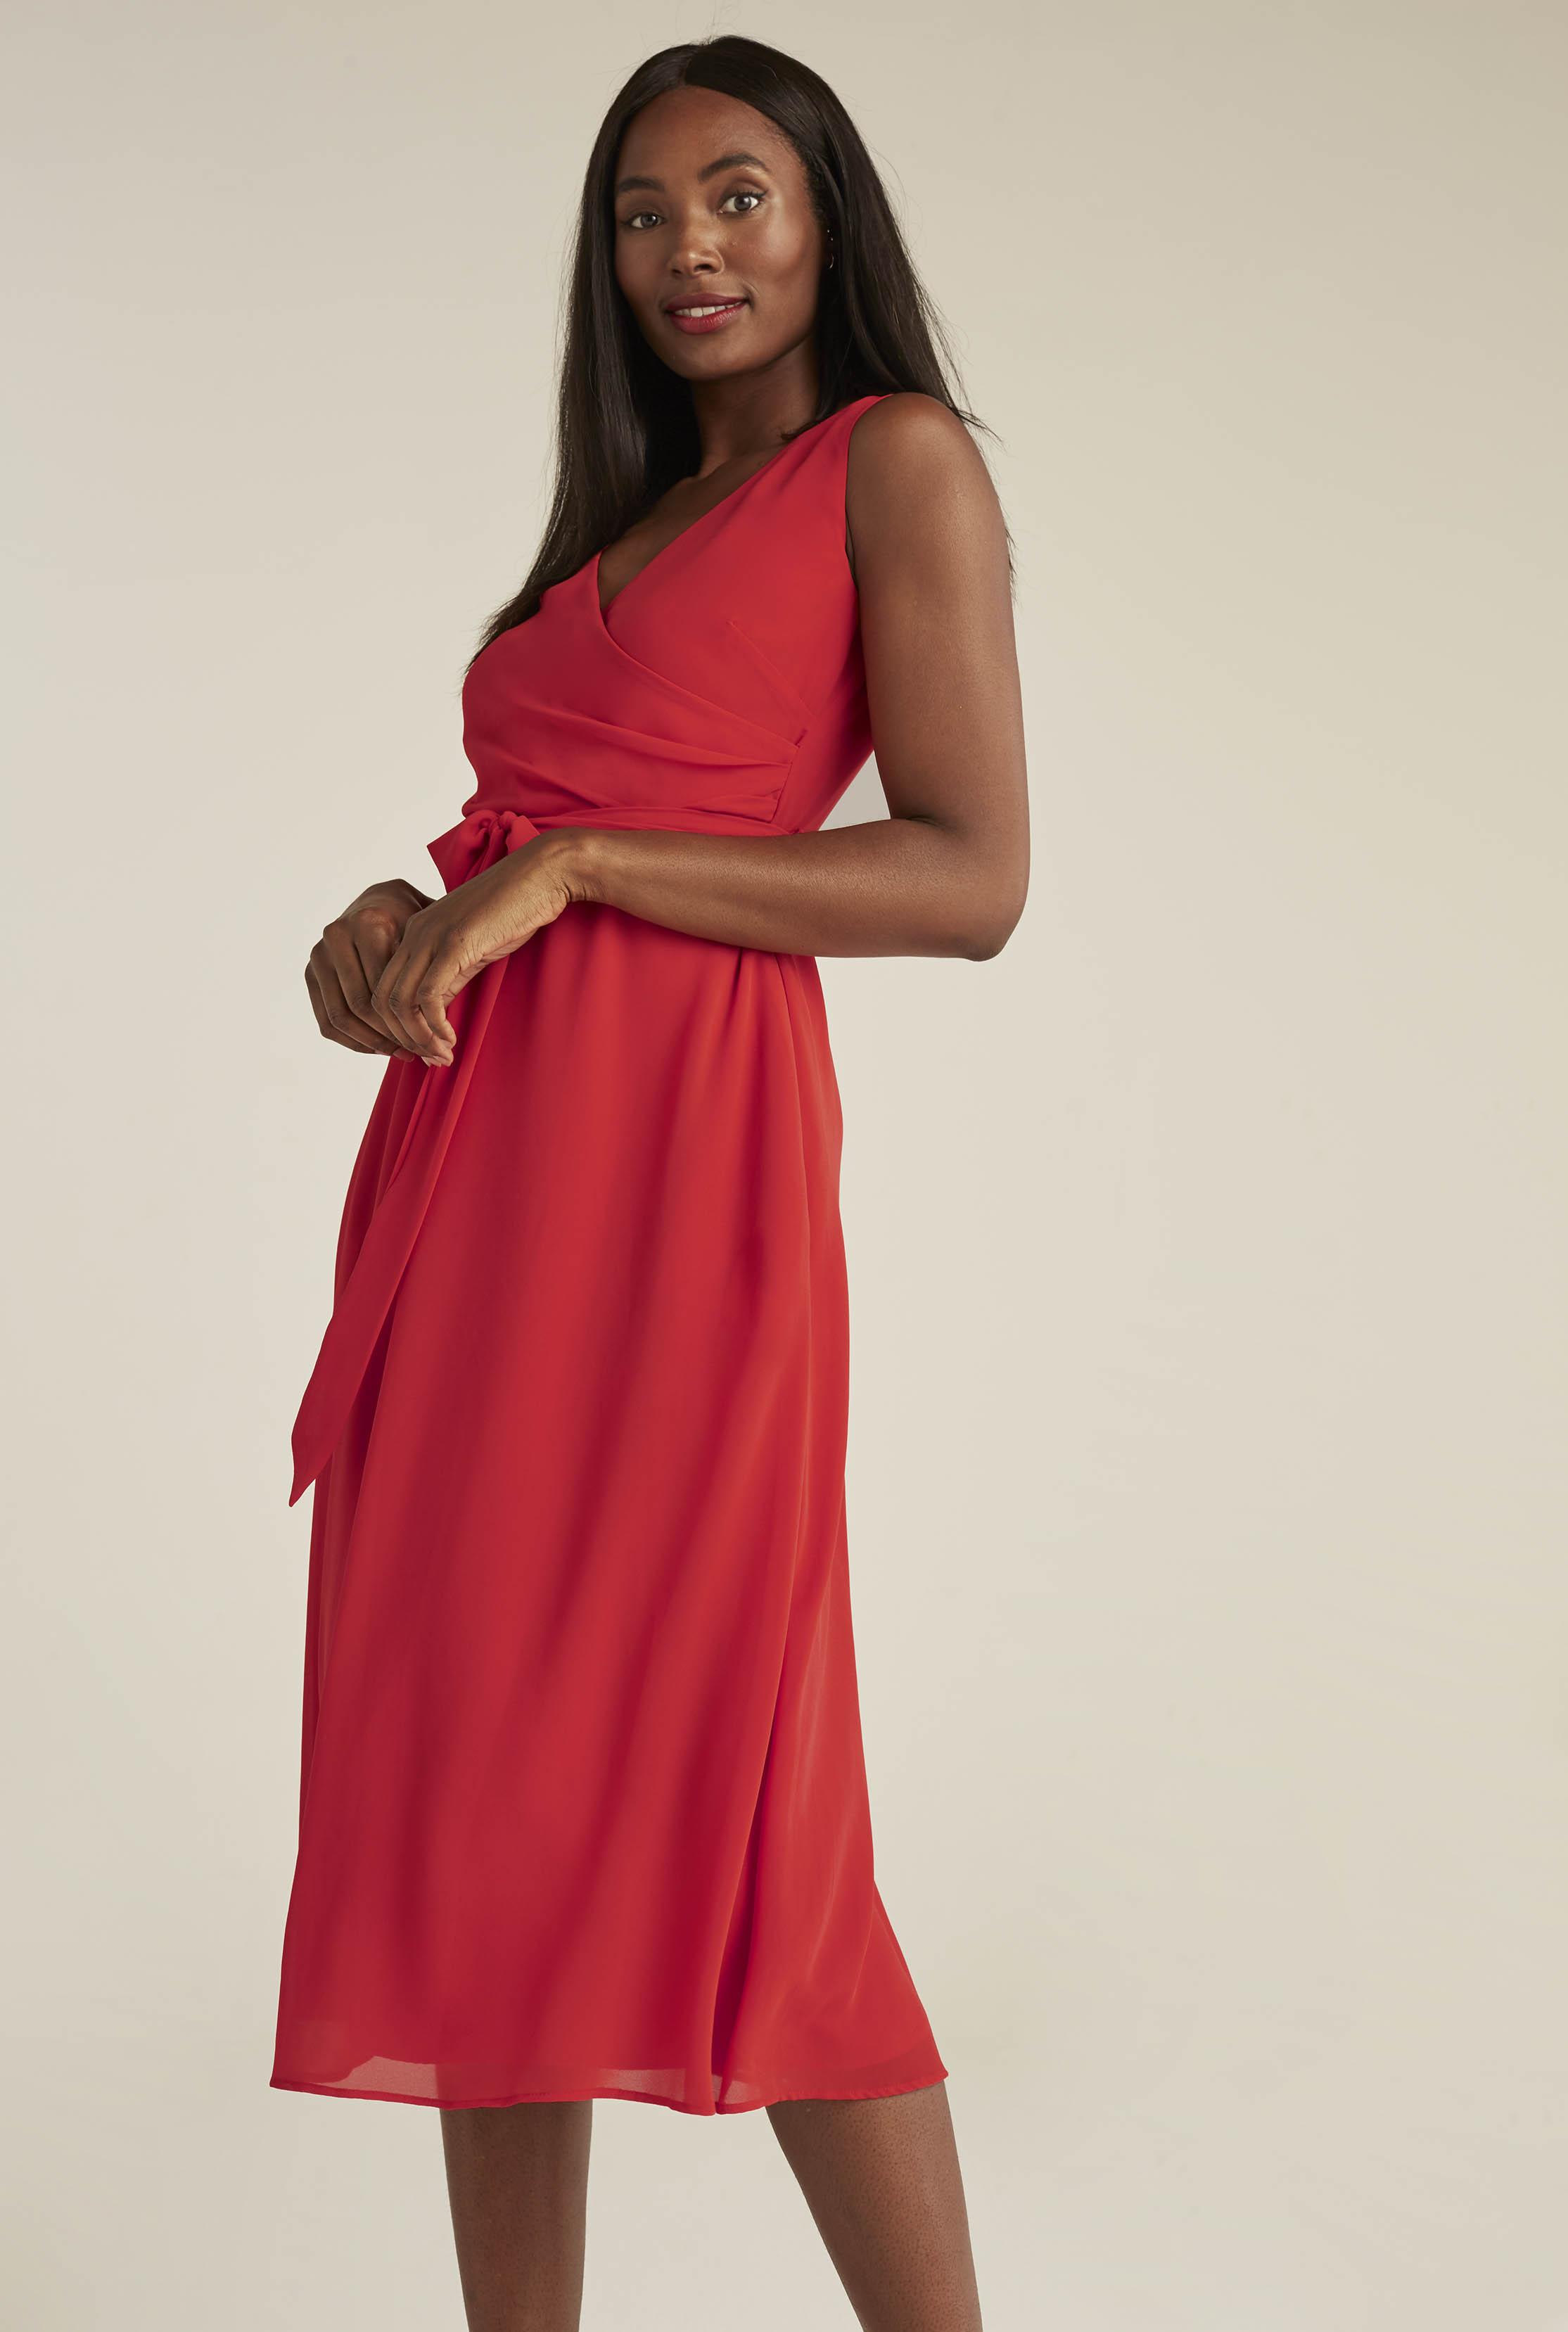 Soft Chiffon Wrap A-line Dress